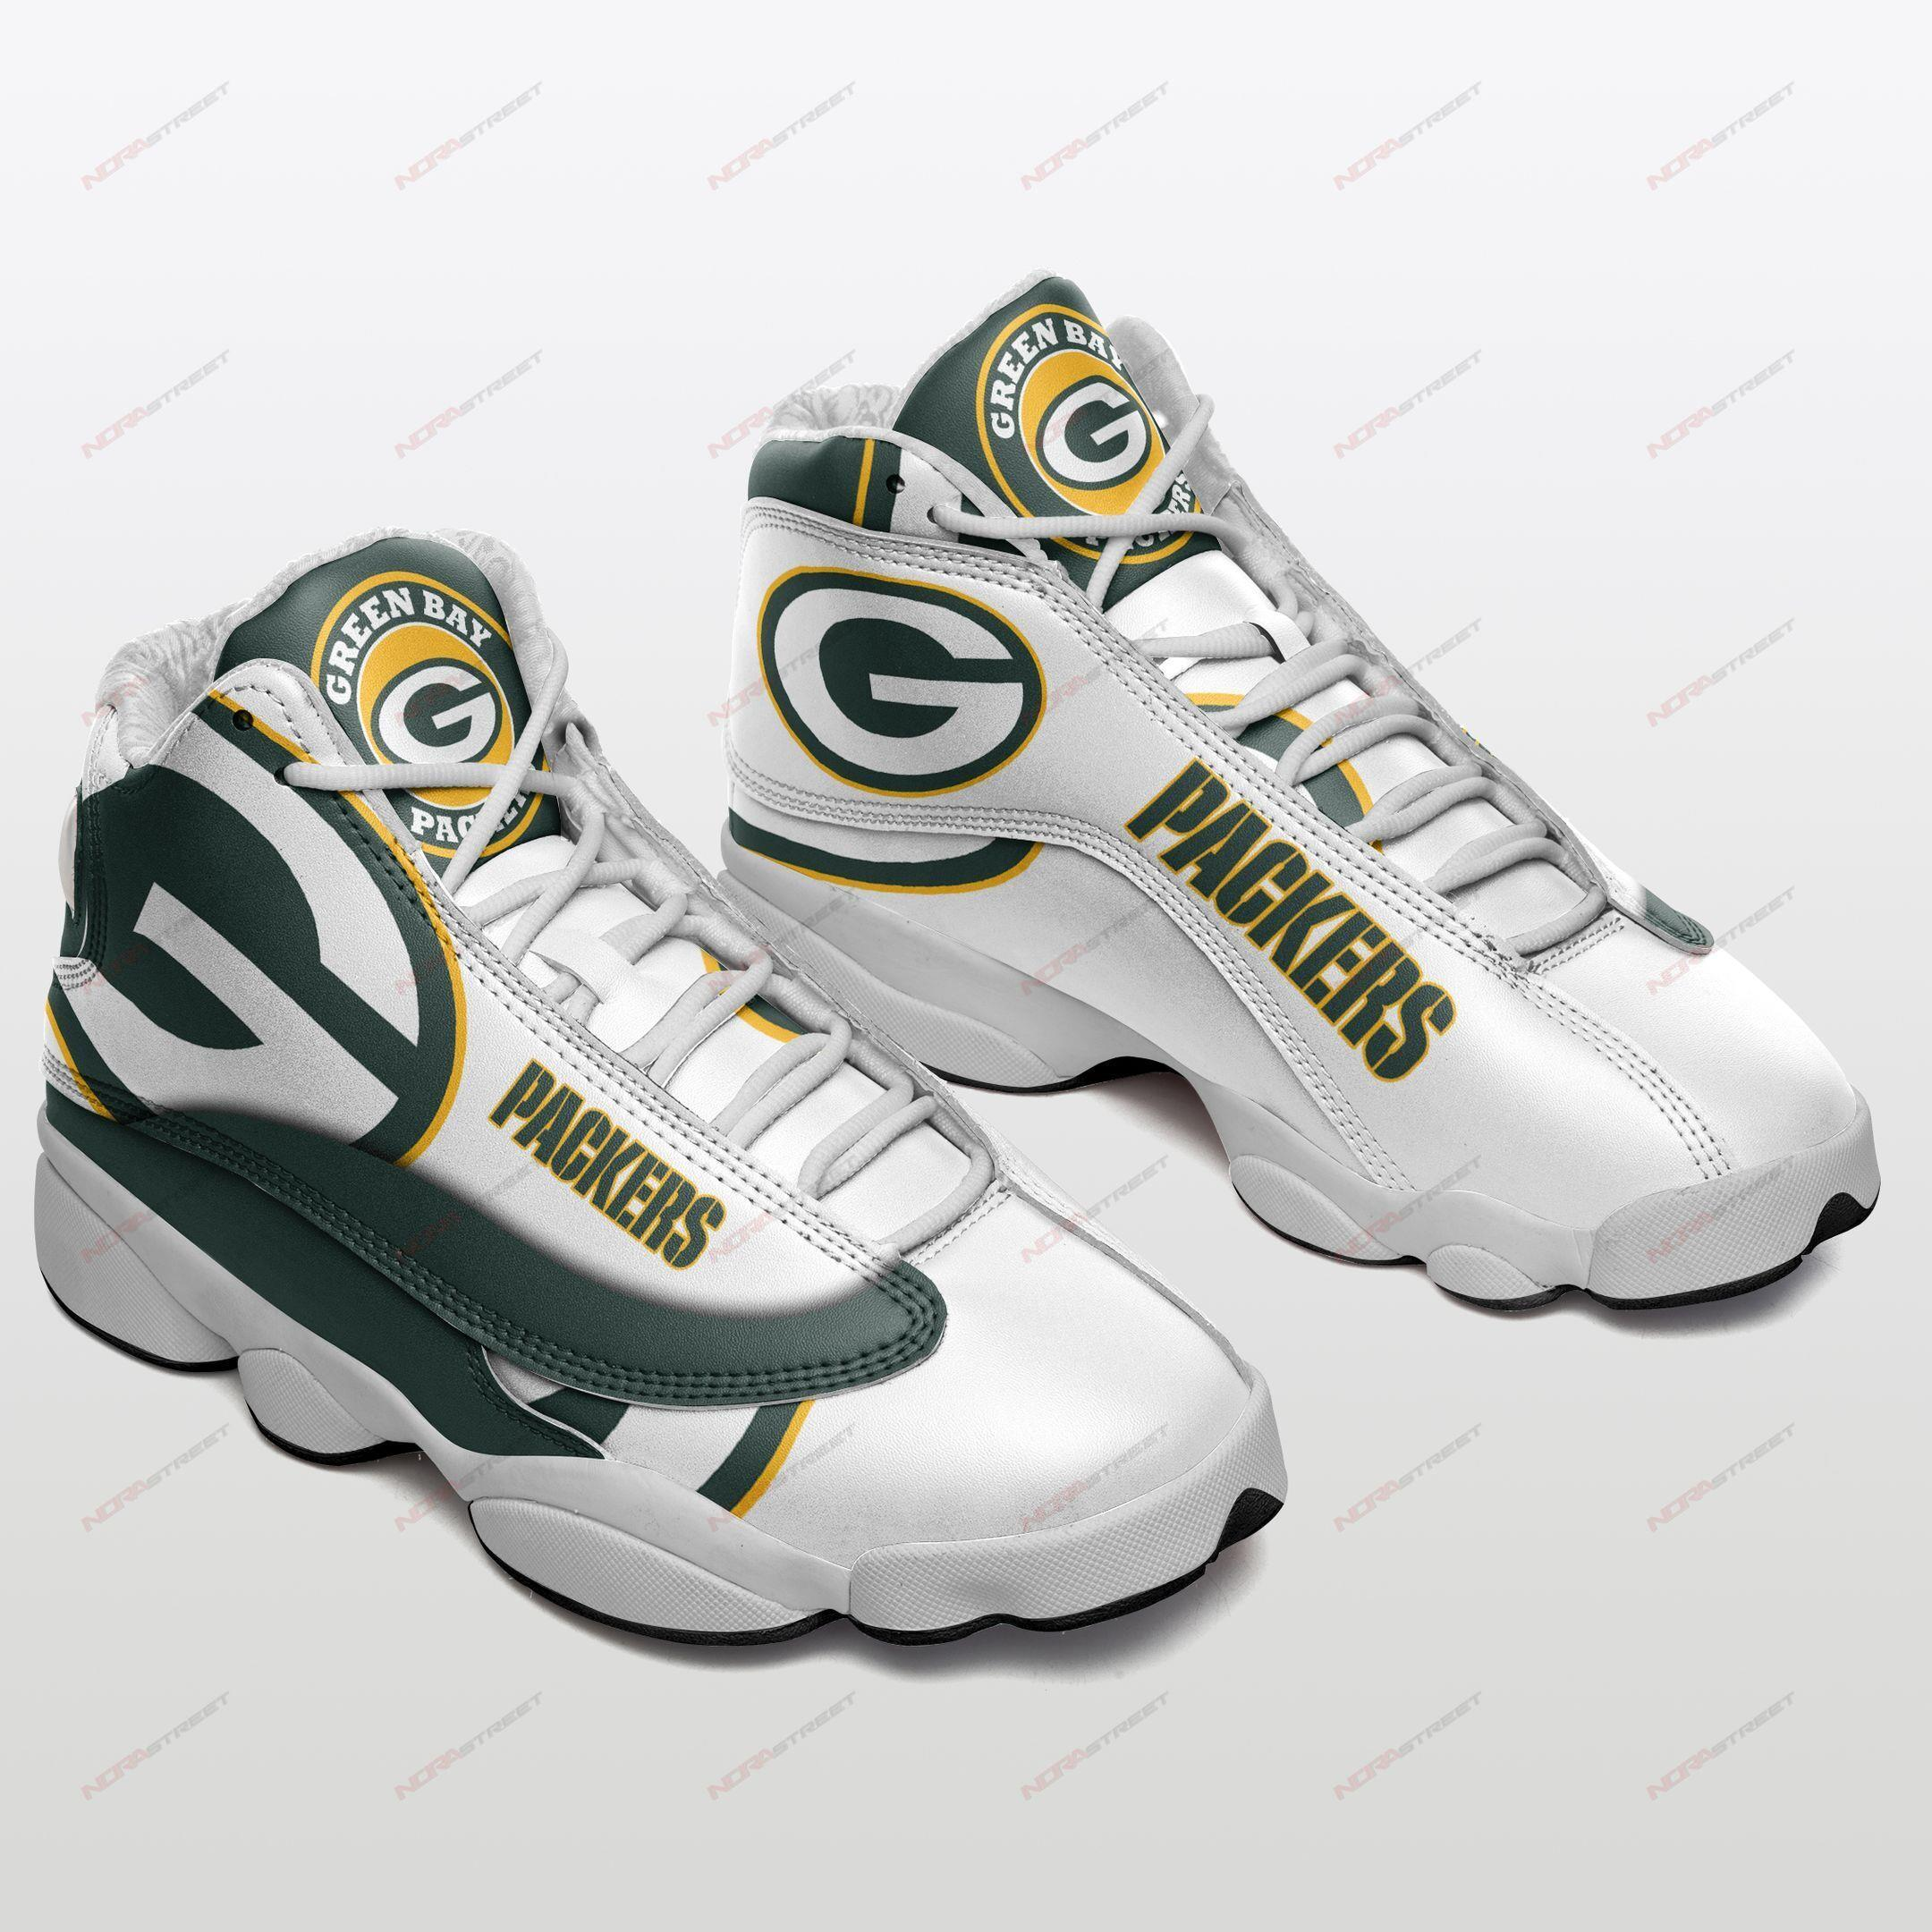 Green Bay Packers Air Jordan 13 Sneakers Sport Shoes Full Size